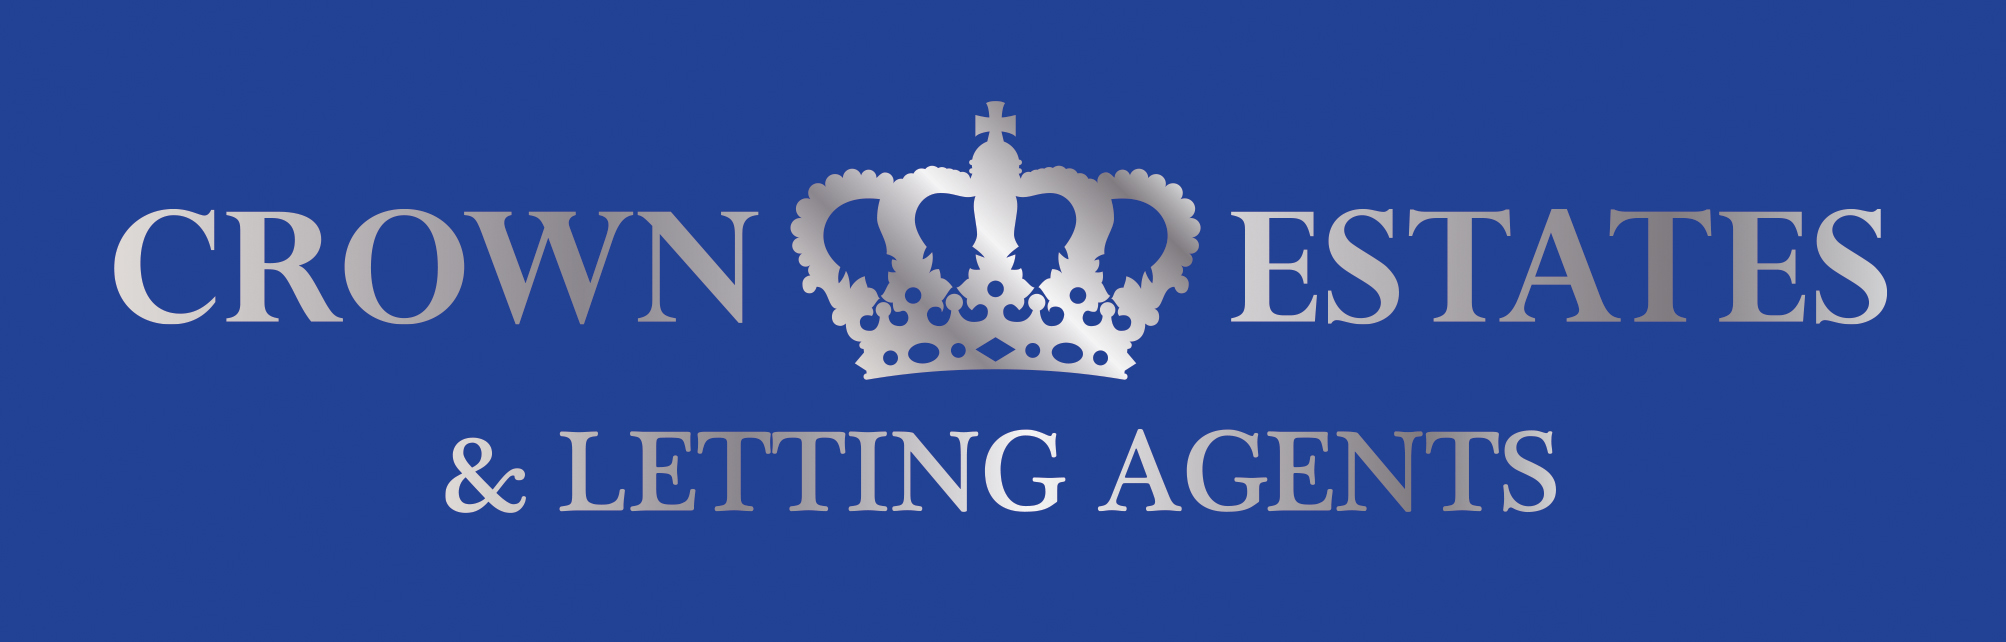 Crown Estates & Letting Agents